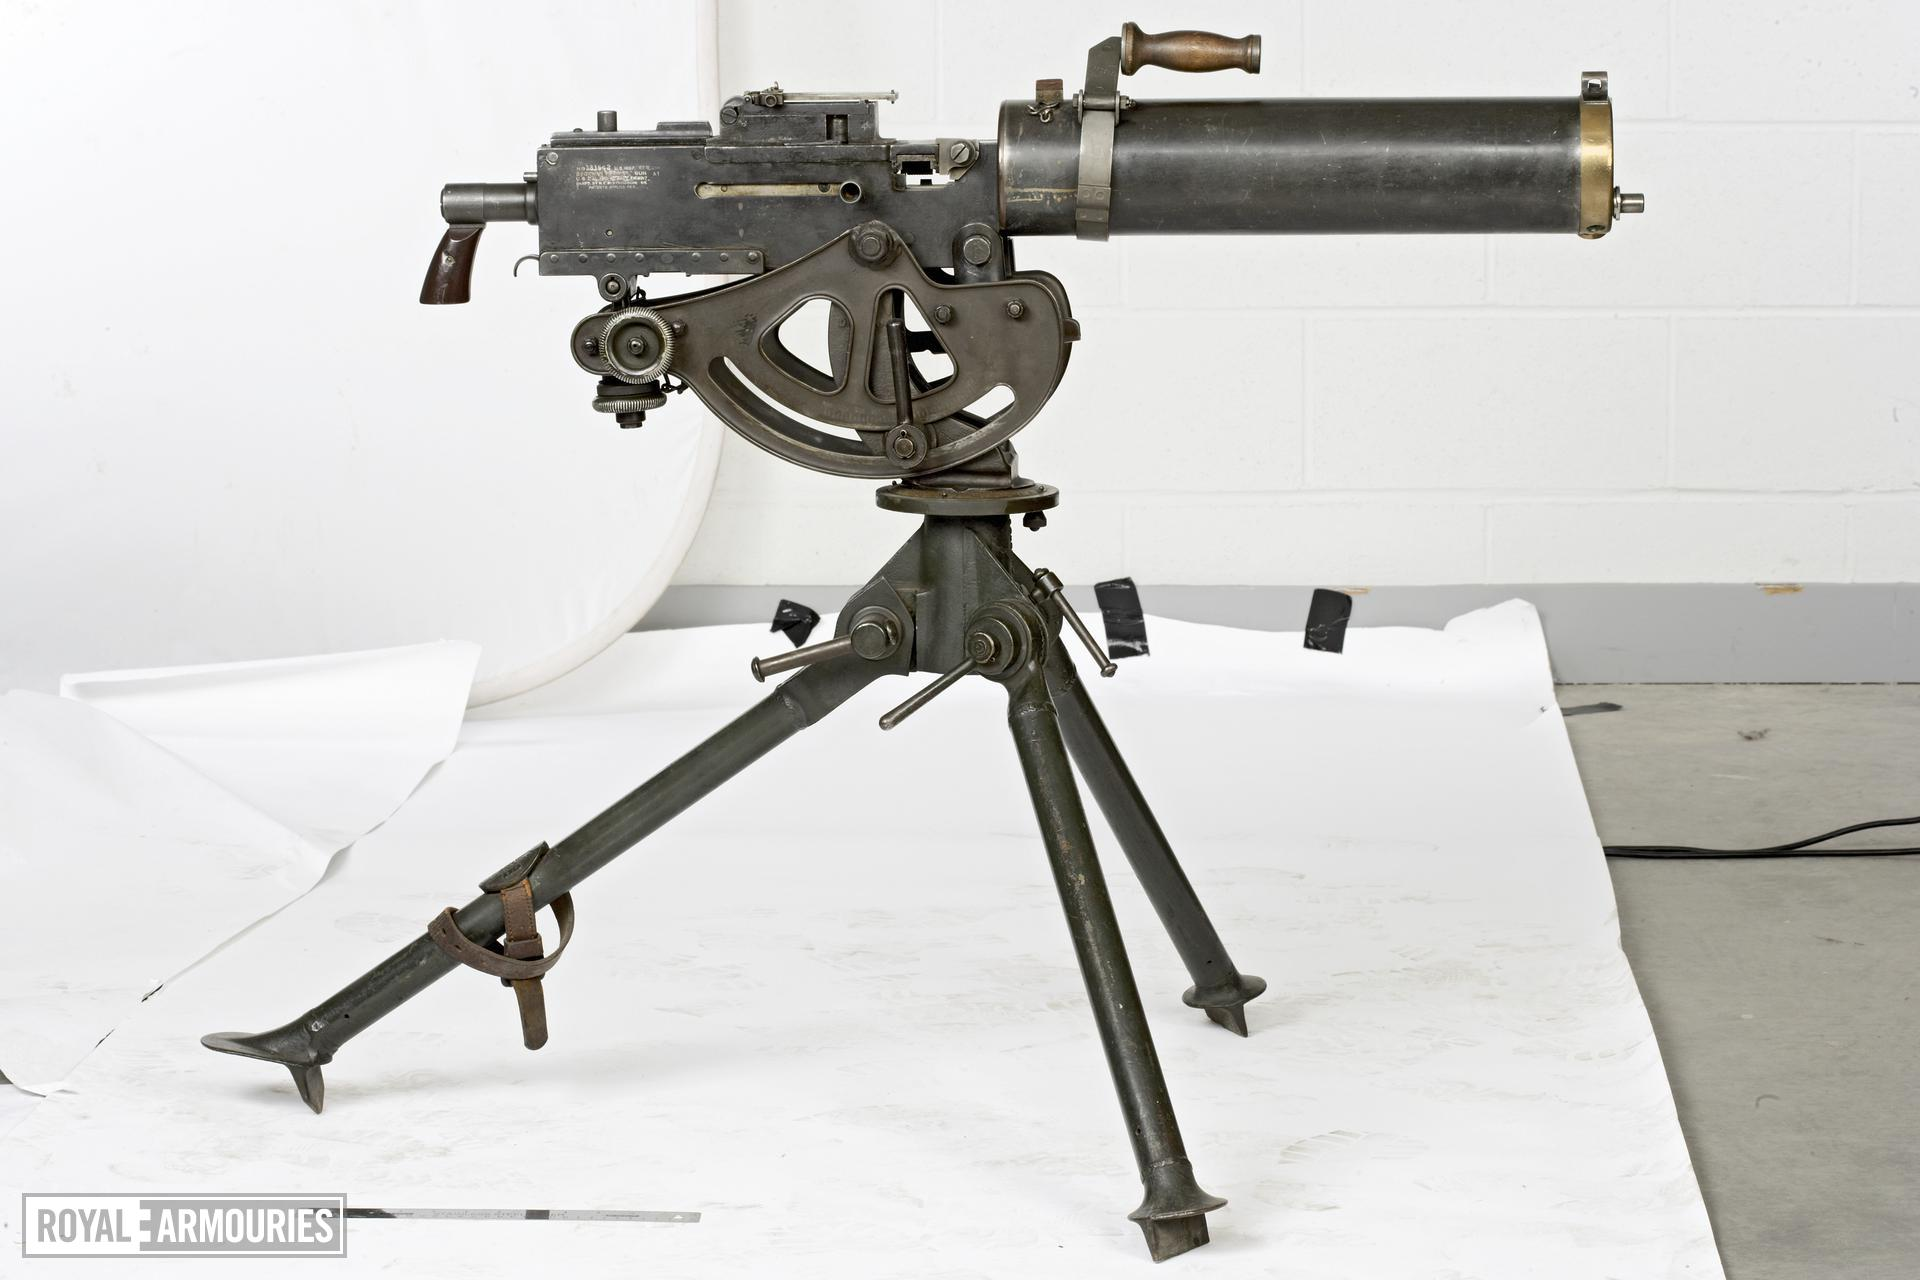 Centrefire automatic machine gun - Browning Model 1917A1